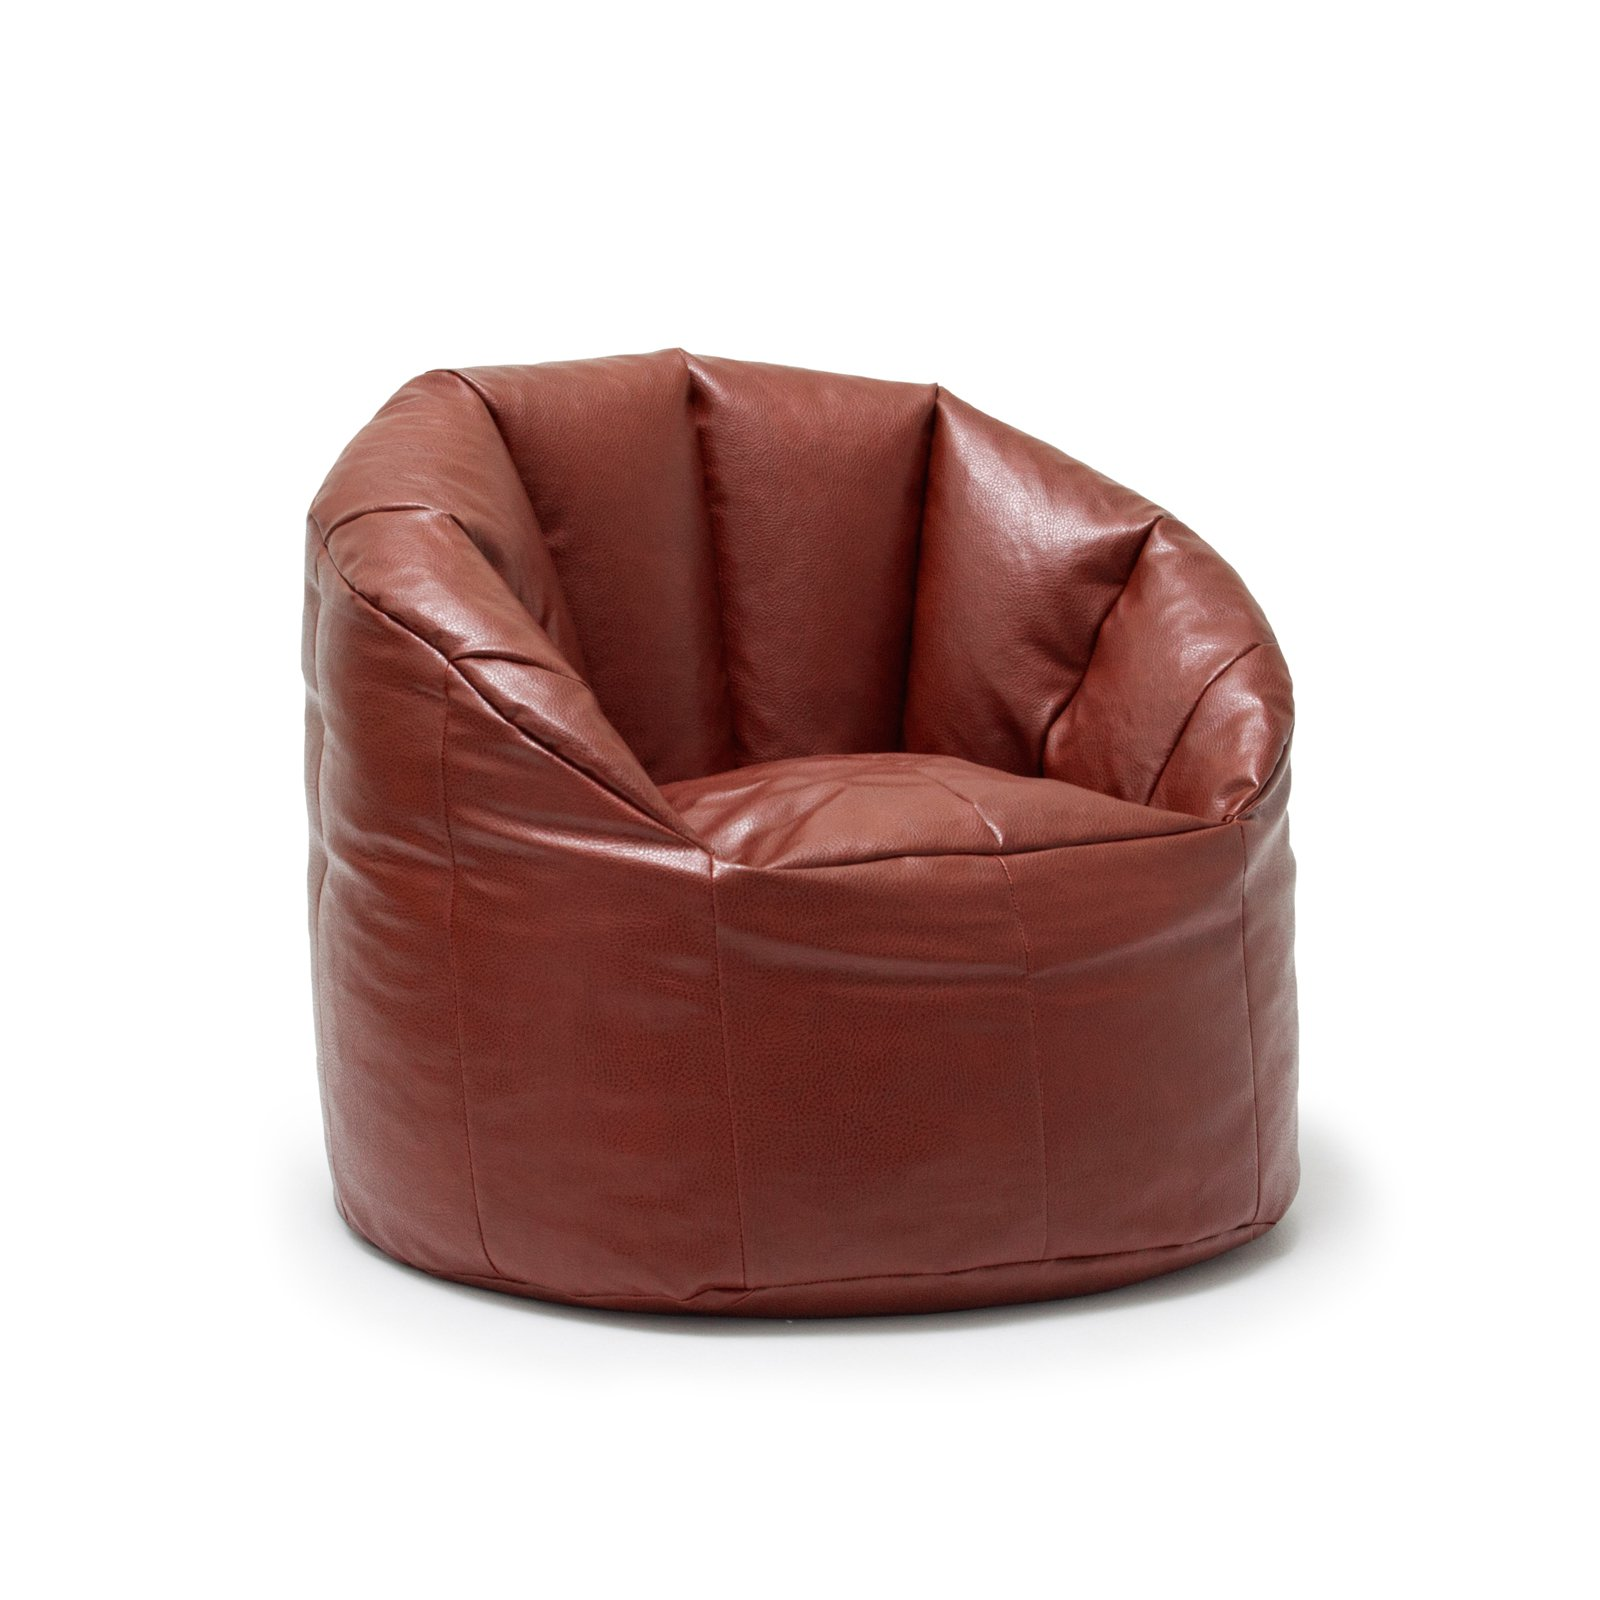 big joe bean bag chair woodland camo price tracking